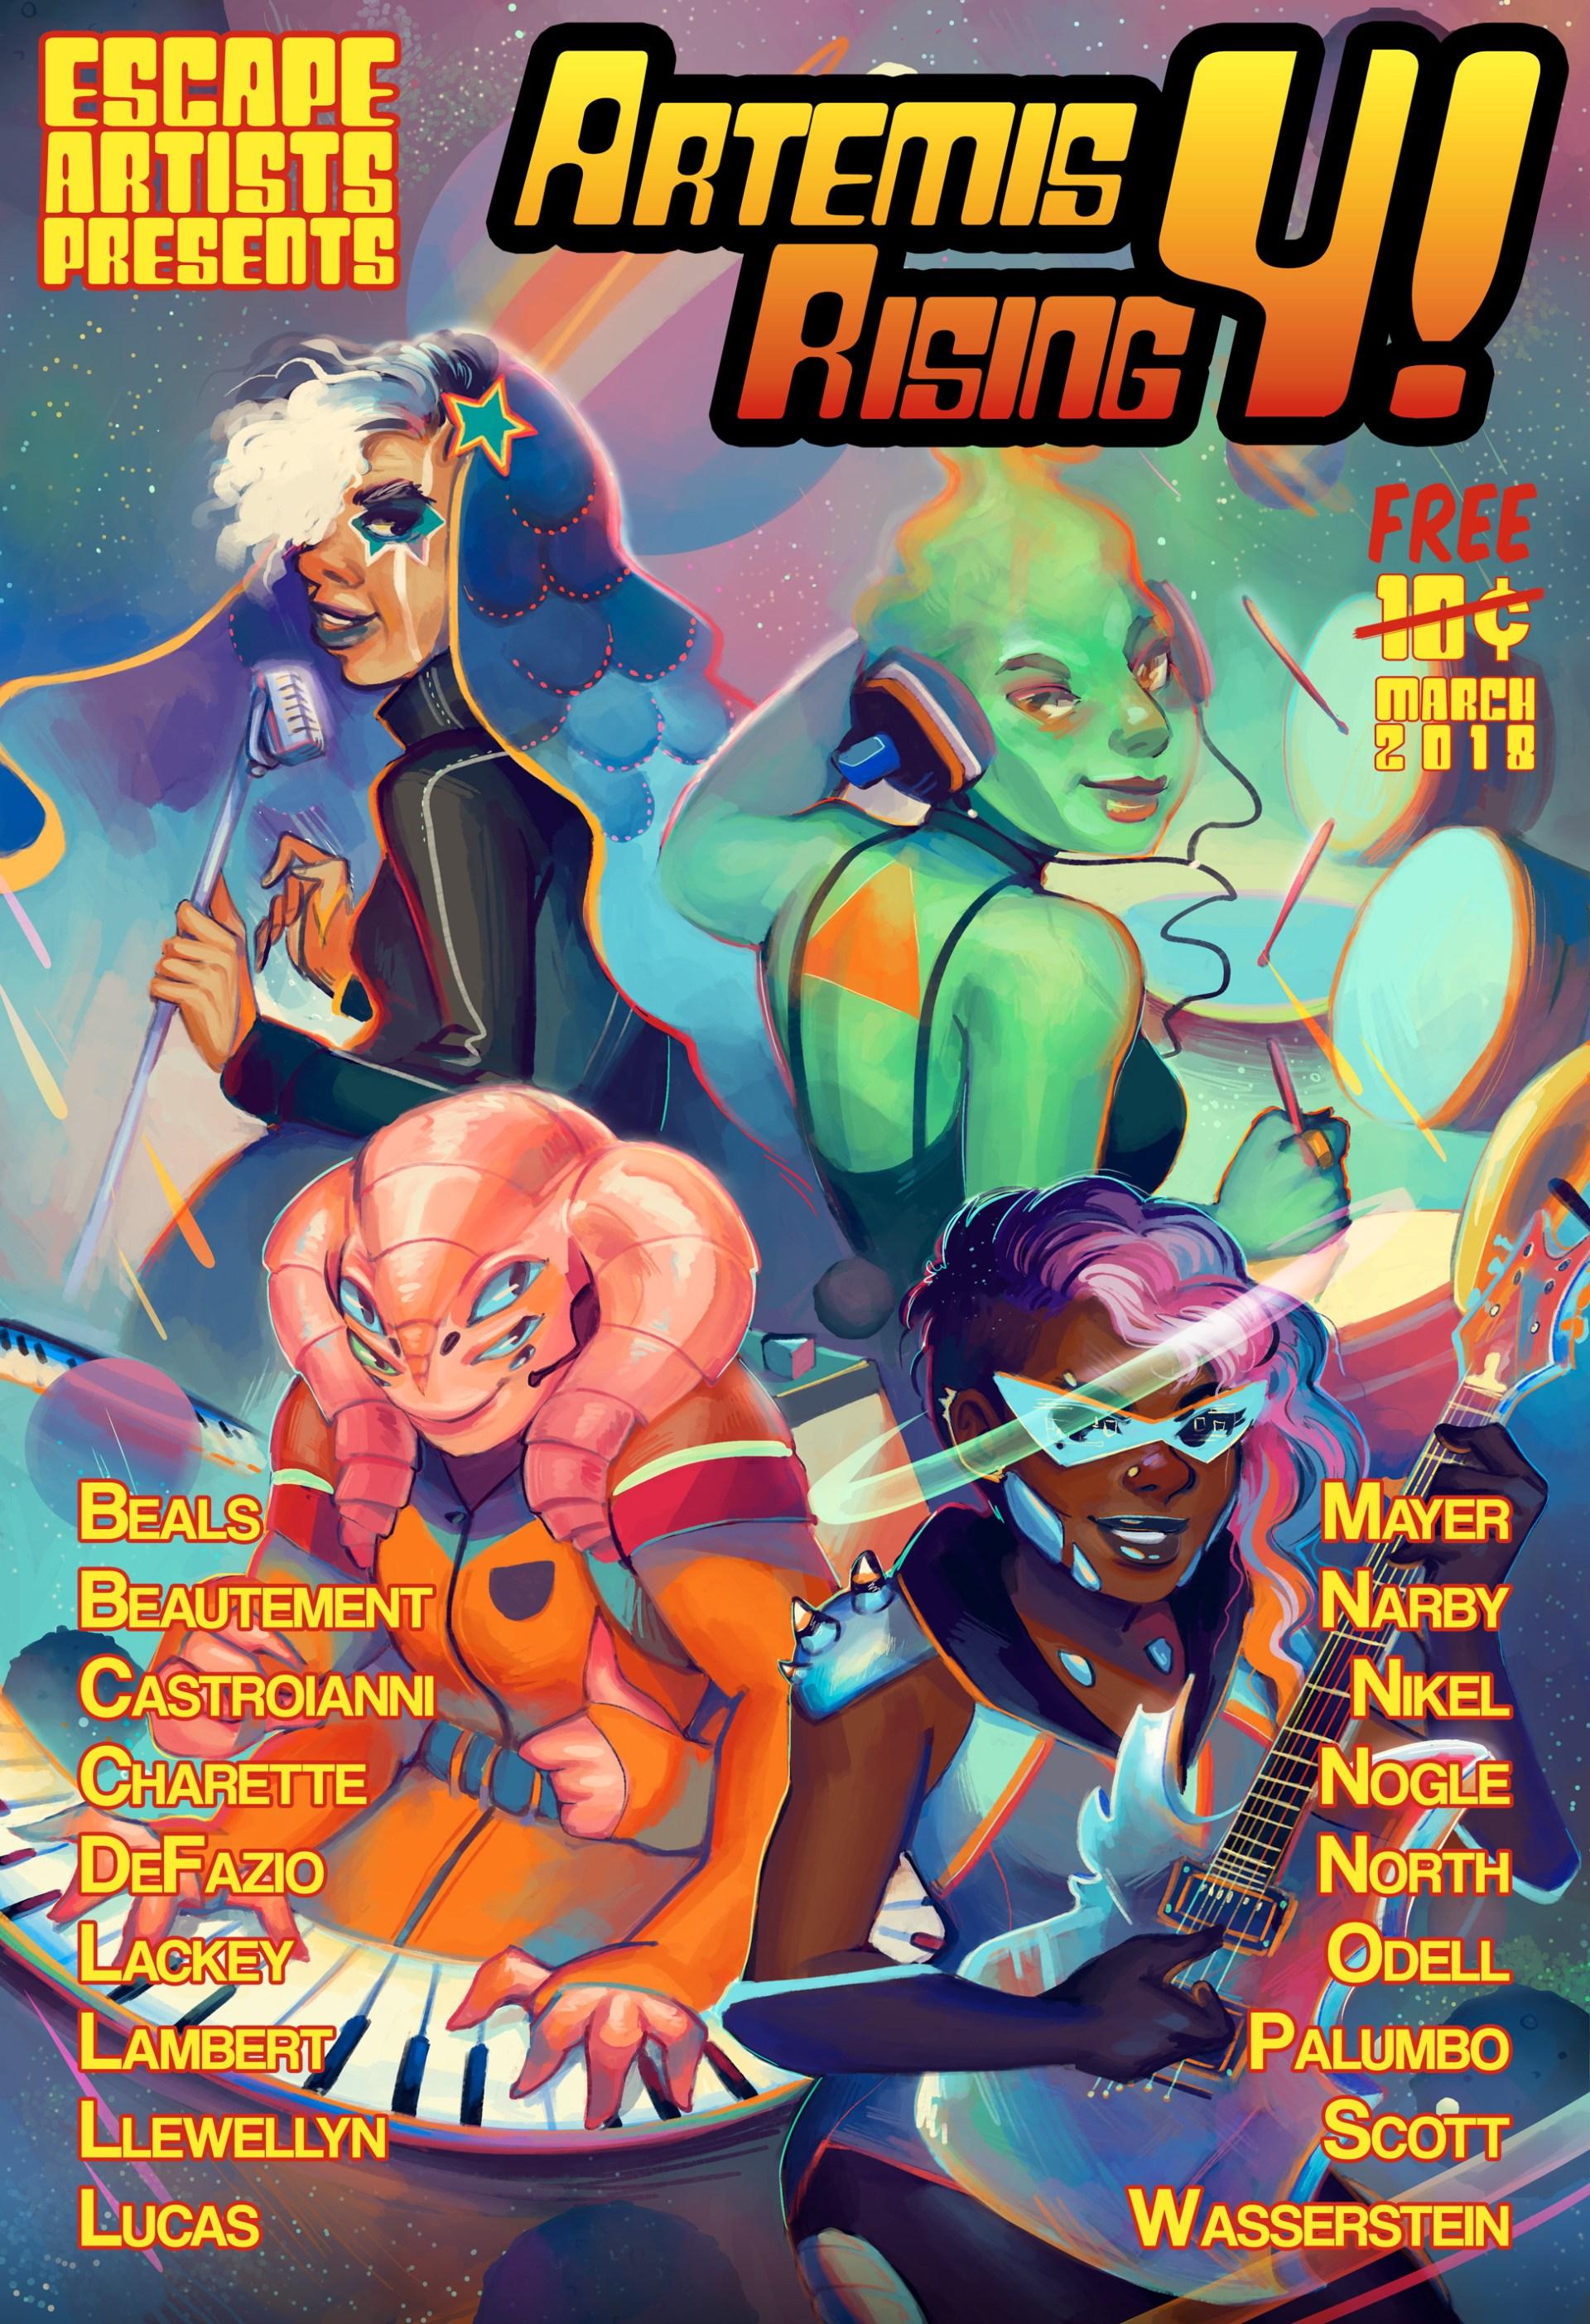 Artemis Rising 4 by Geneva Benton (2018)